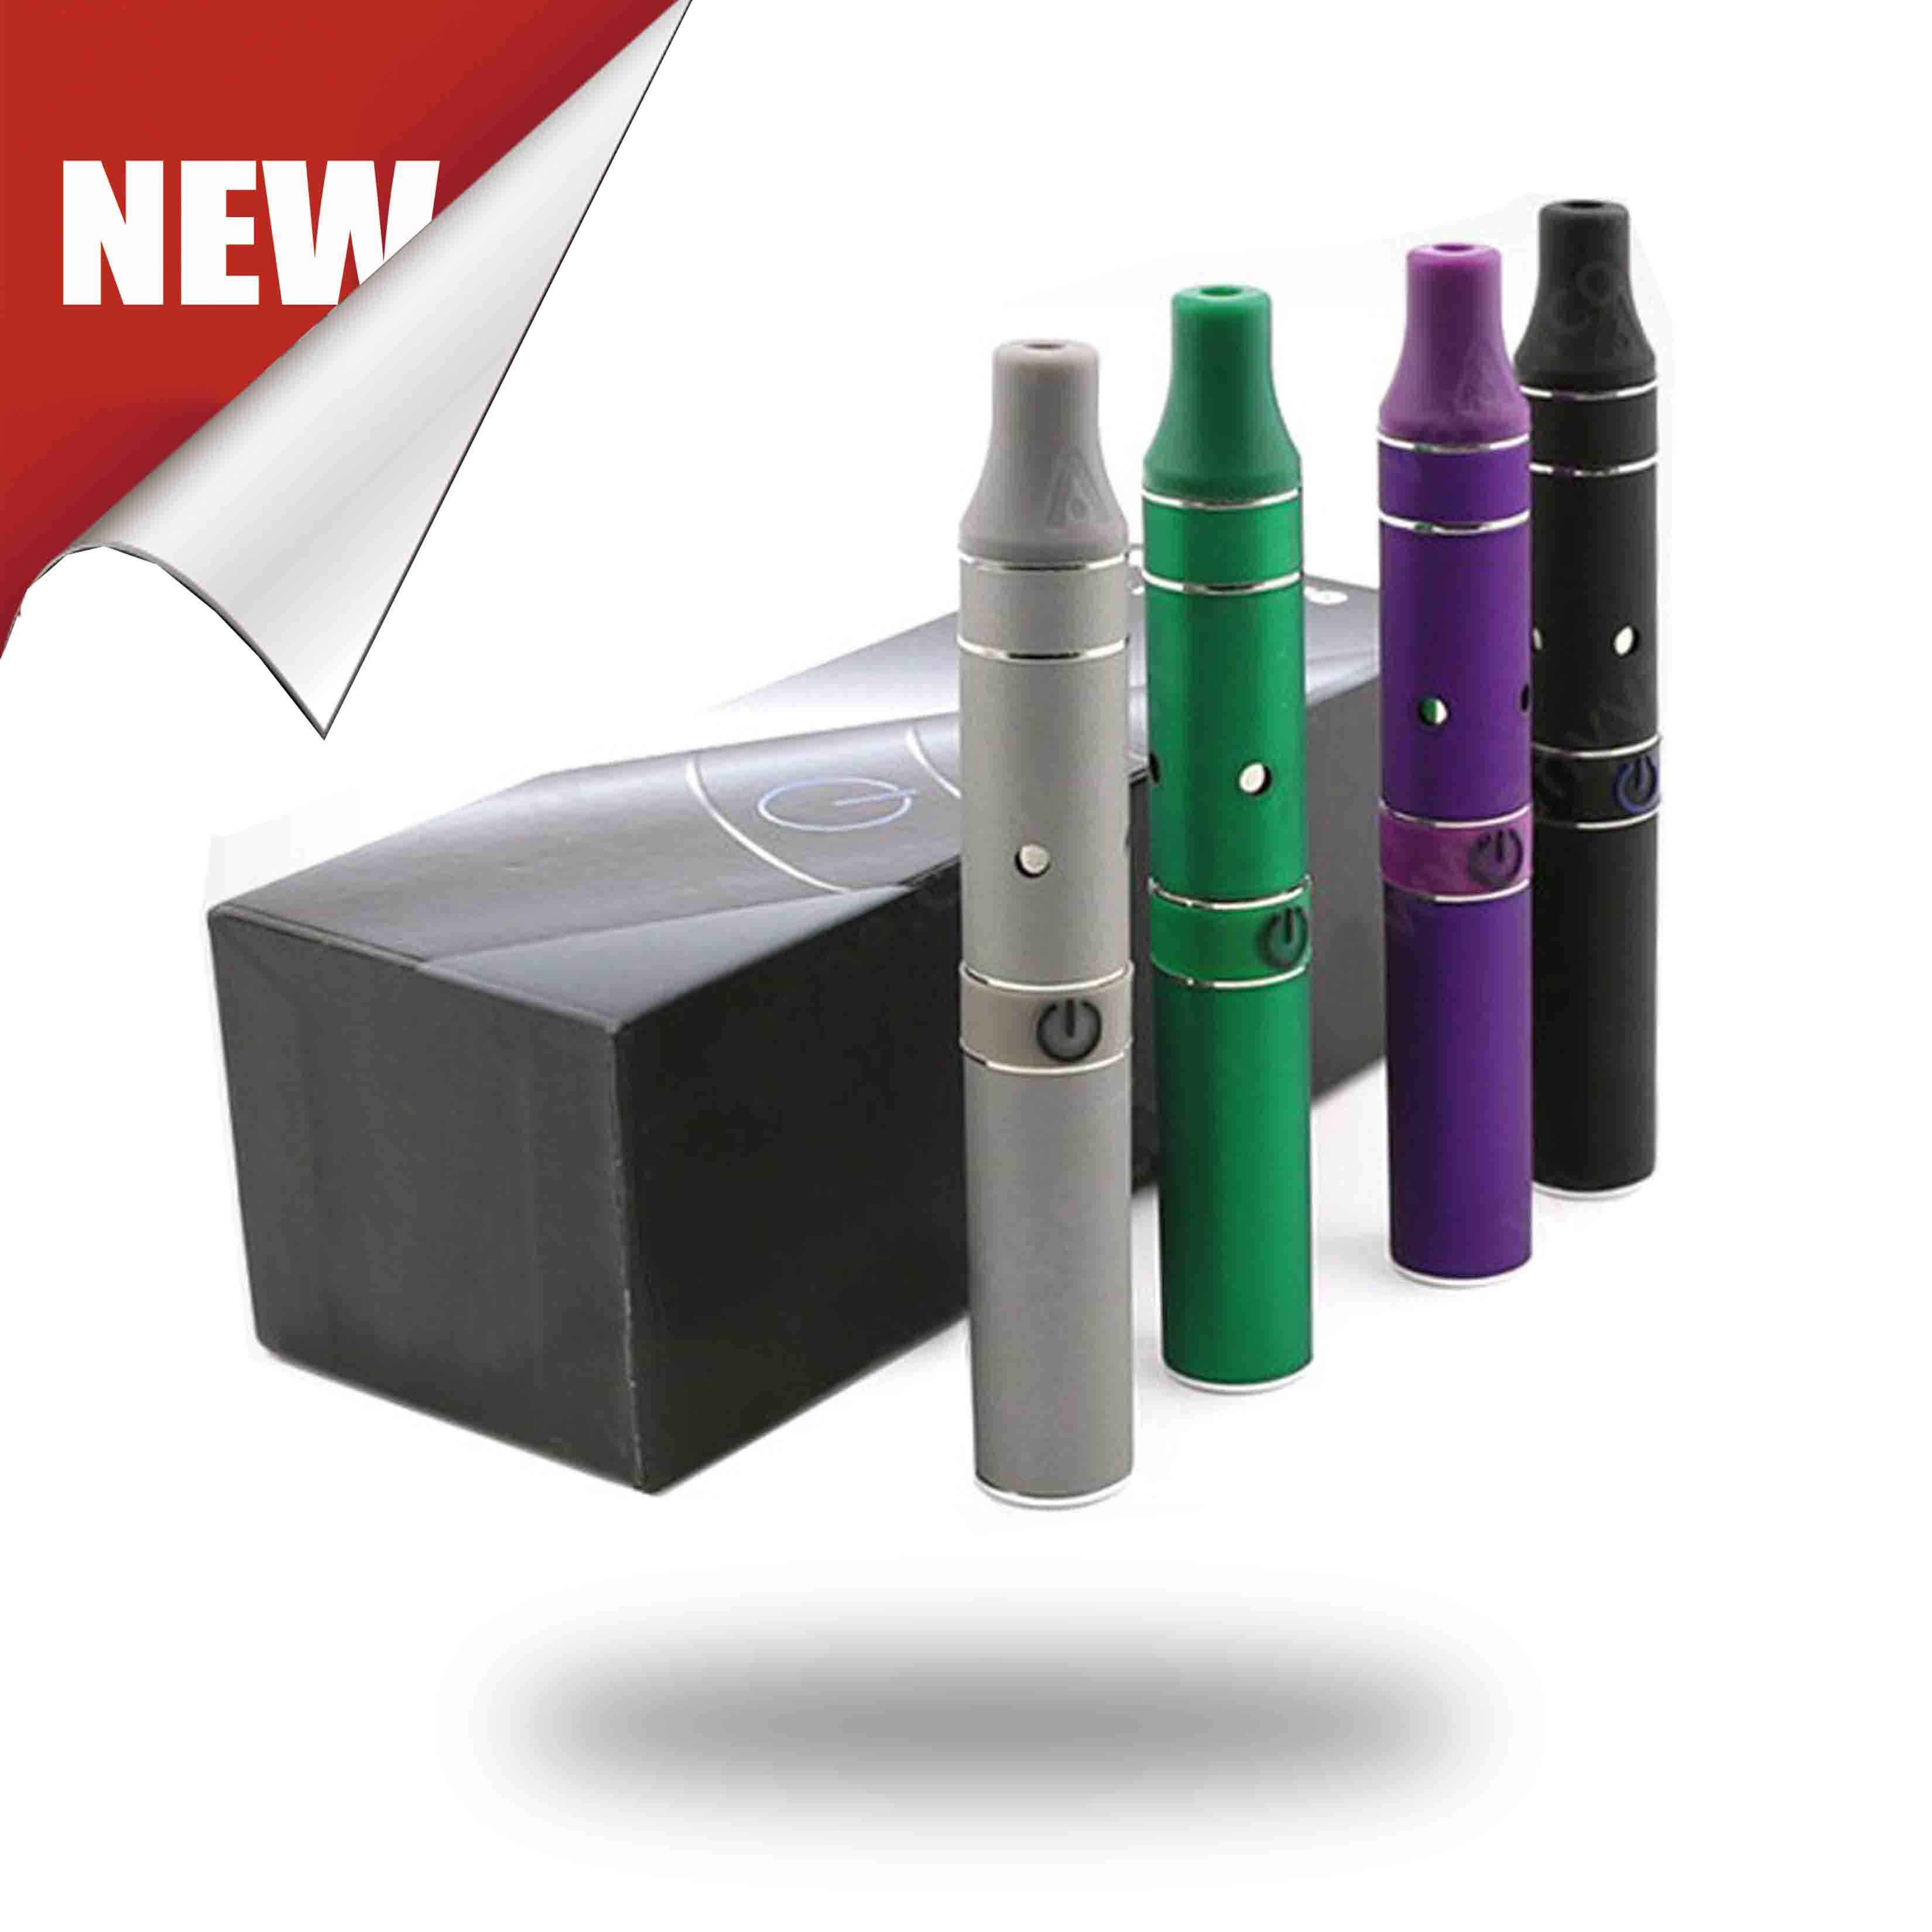 cloud pen 30 vaporizer go evape